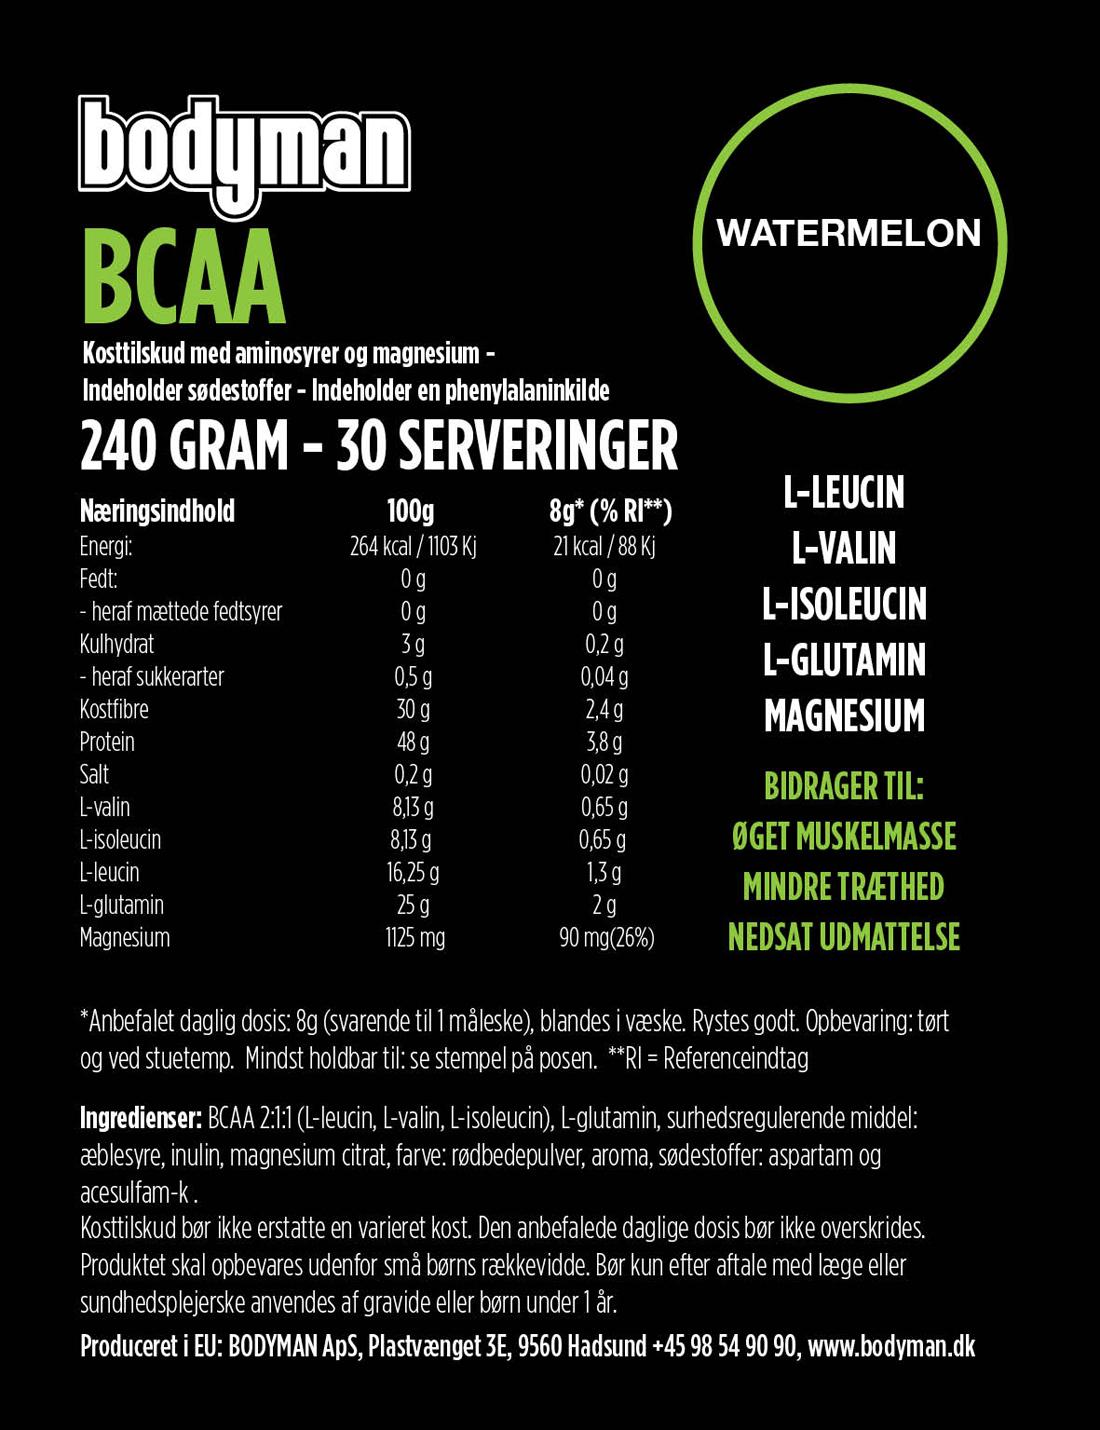 Bodyman BCAA Watermelon 240 Gram fås hos Bodyman